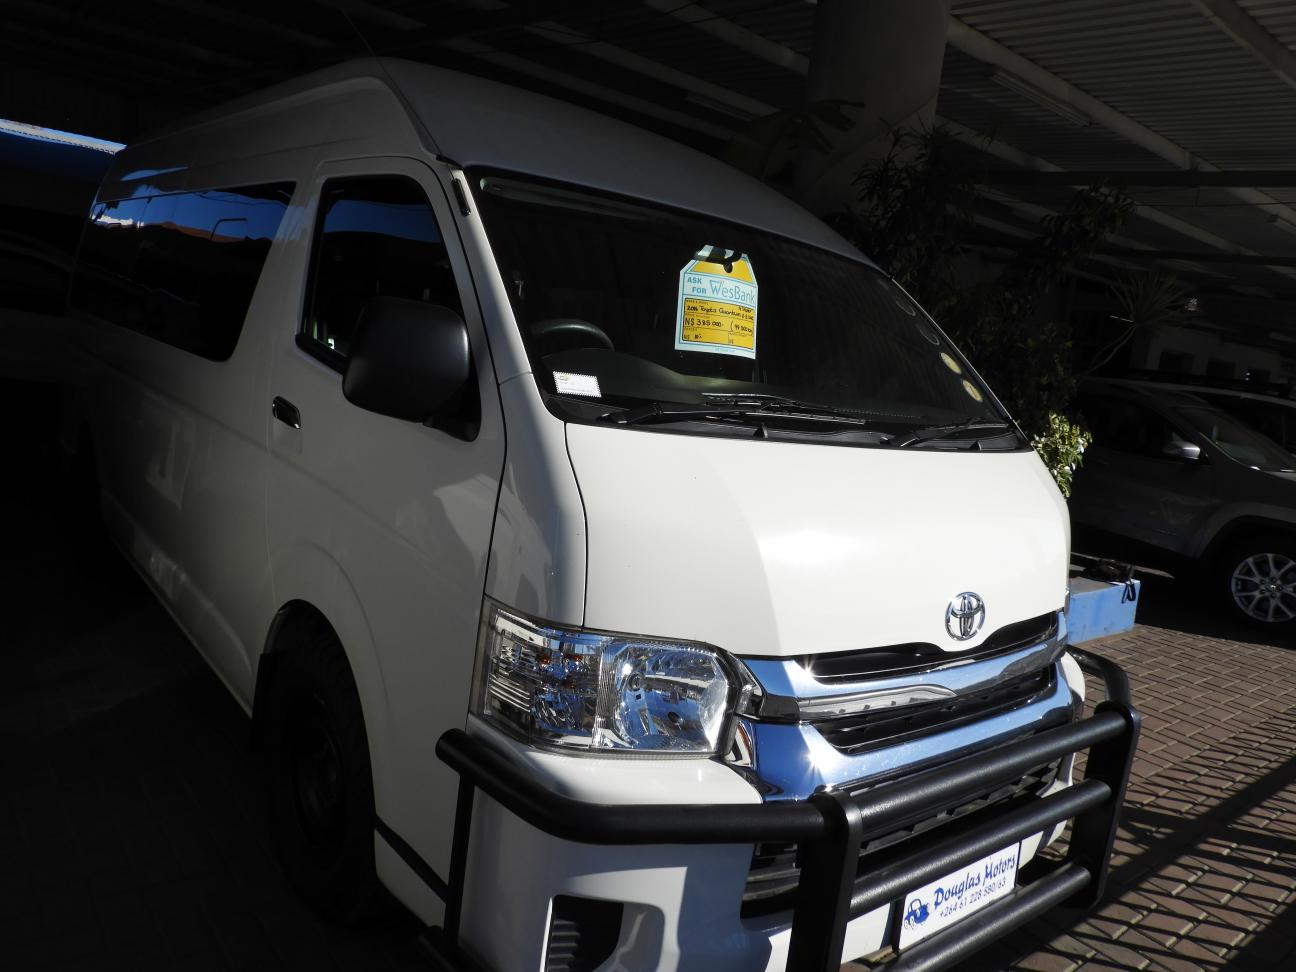 Used Toyota Quantum in Namibia